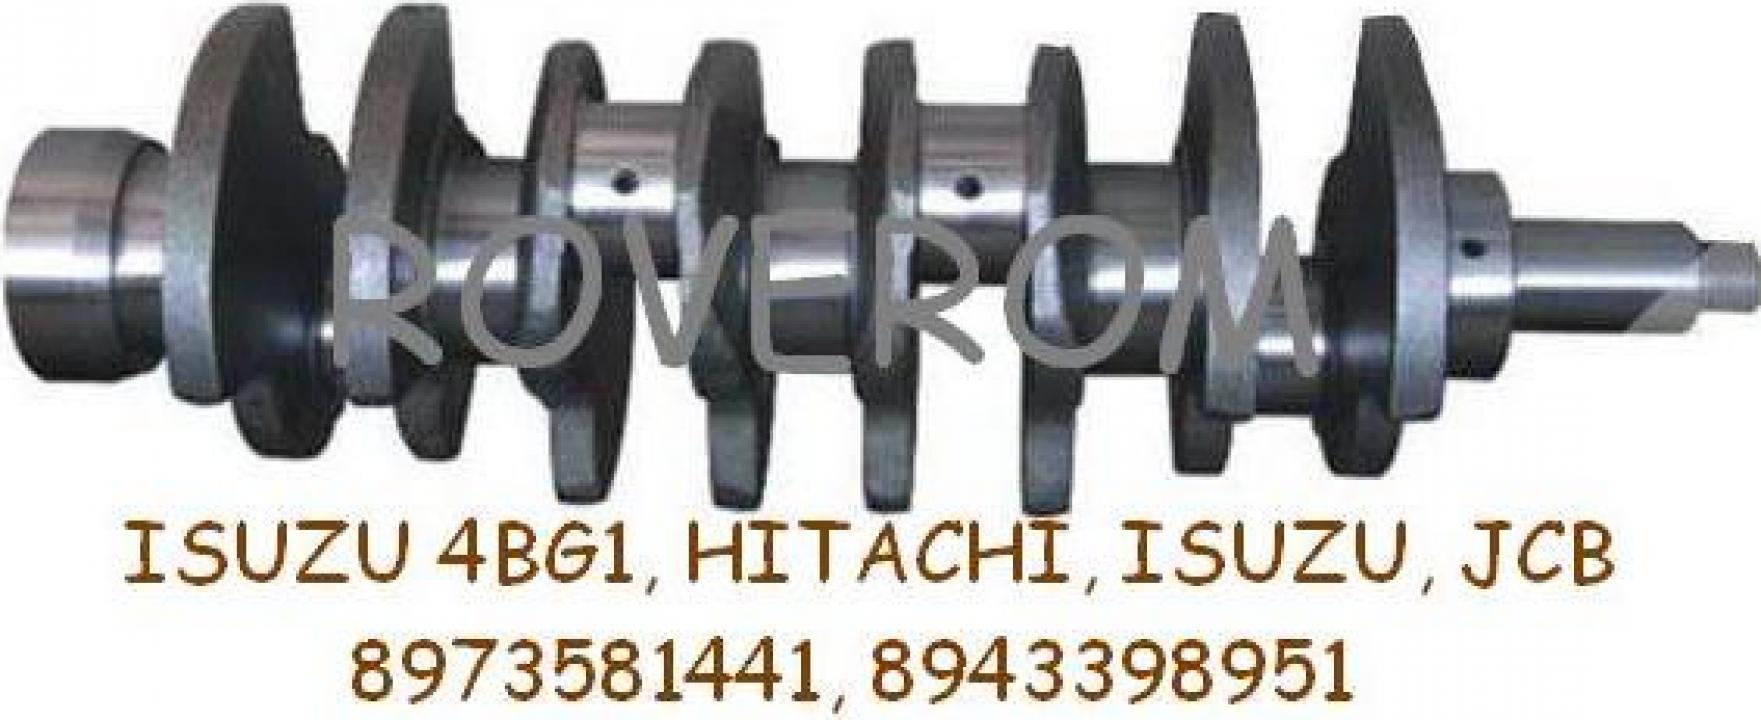 Arbore cotit Isuzu 4BG1, Hitachi, Isuzu, JCB